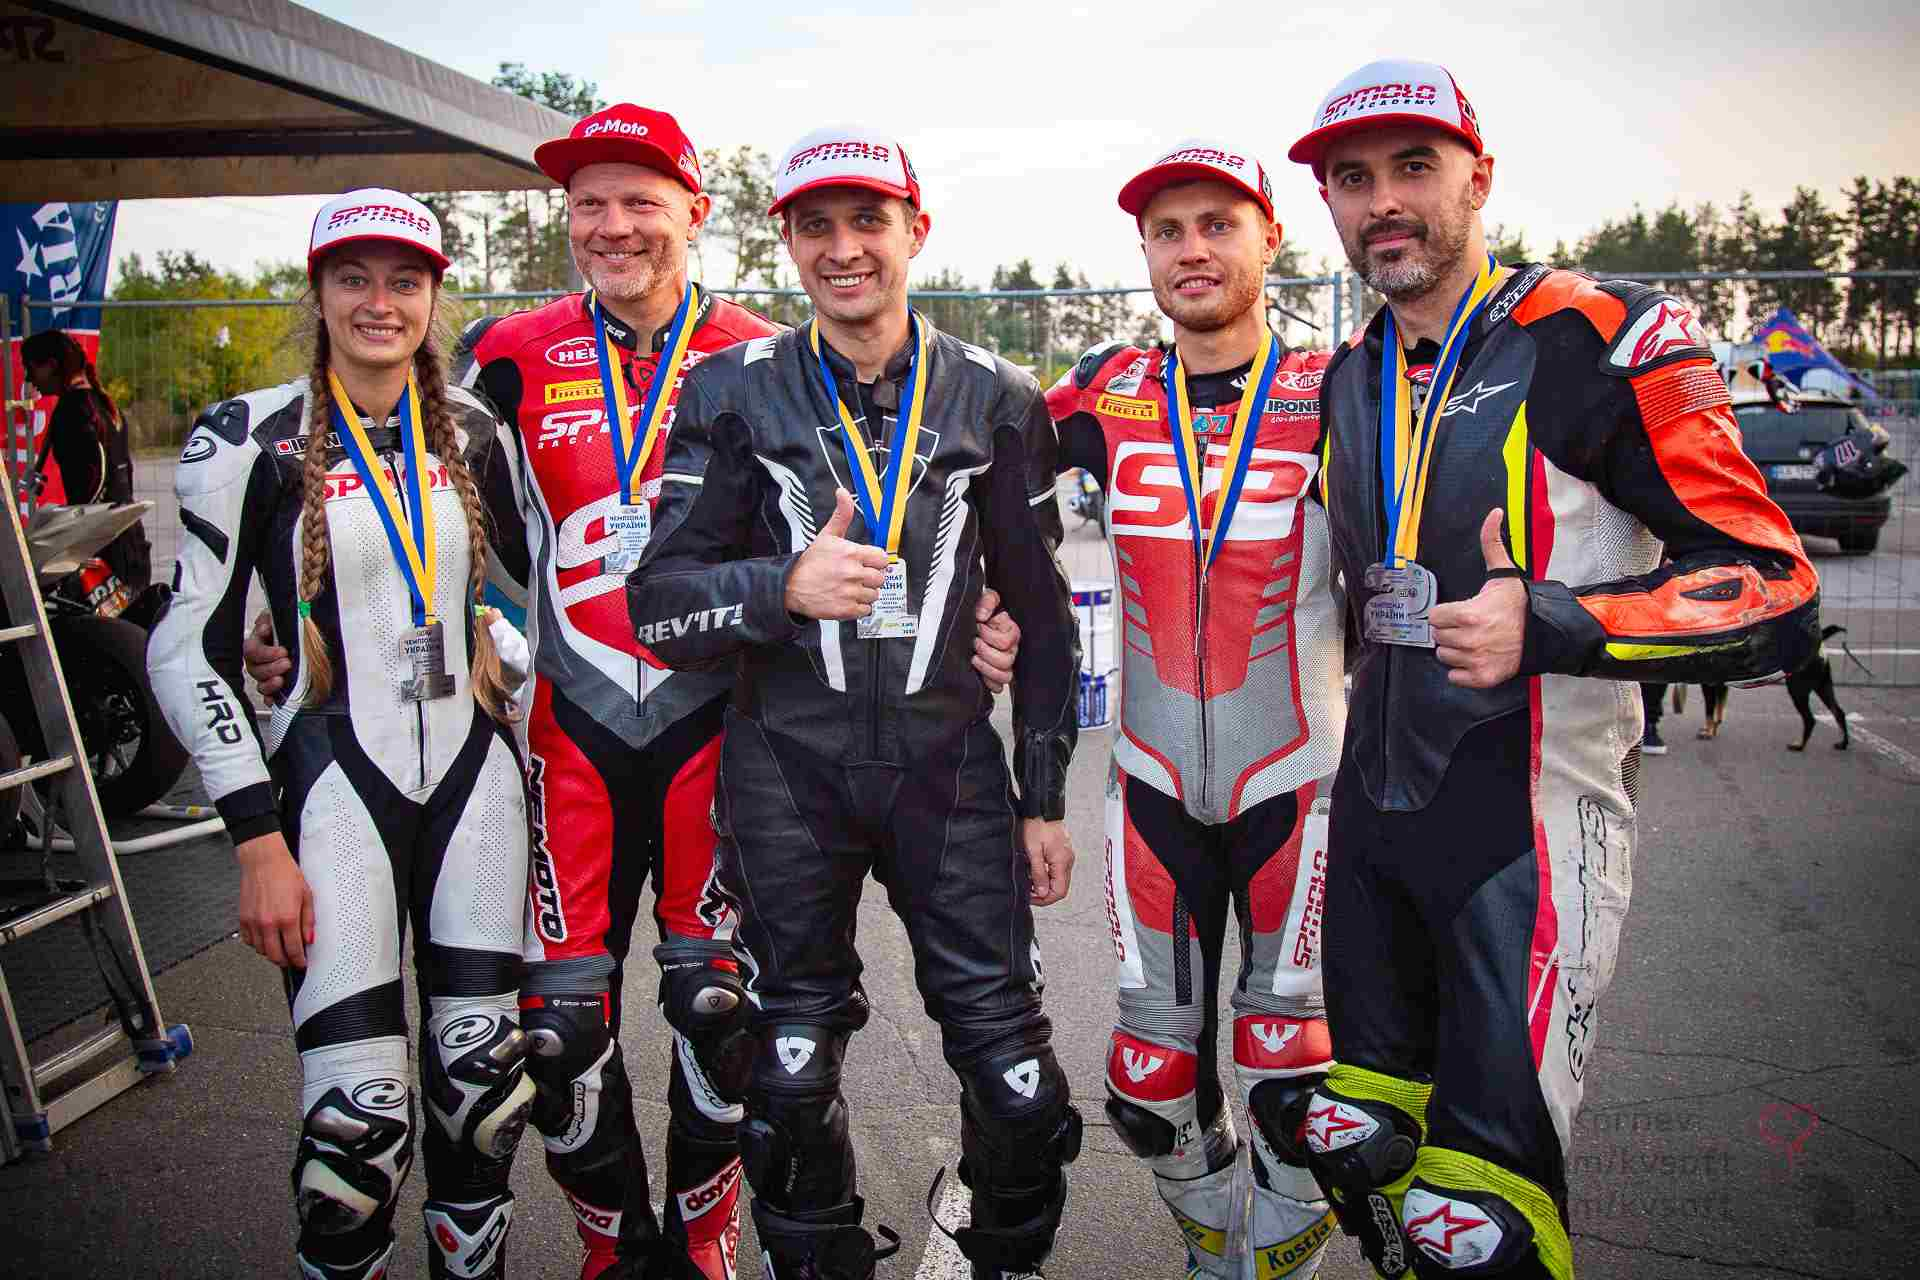 5-6_etap_MotoGPUkraine_096